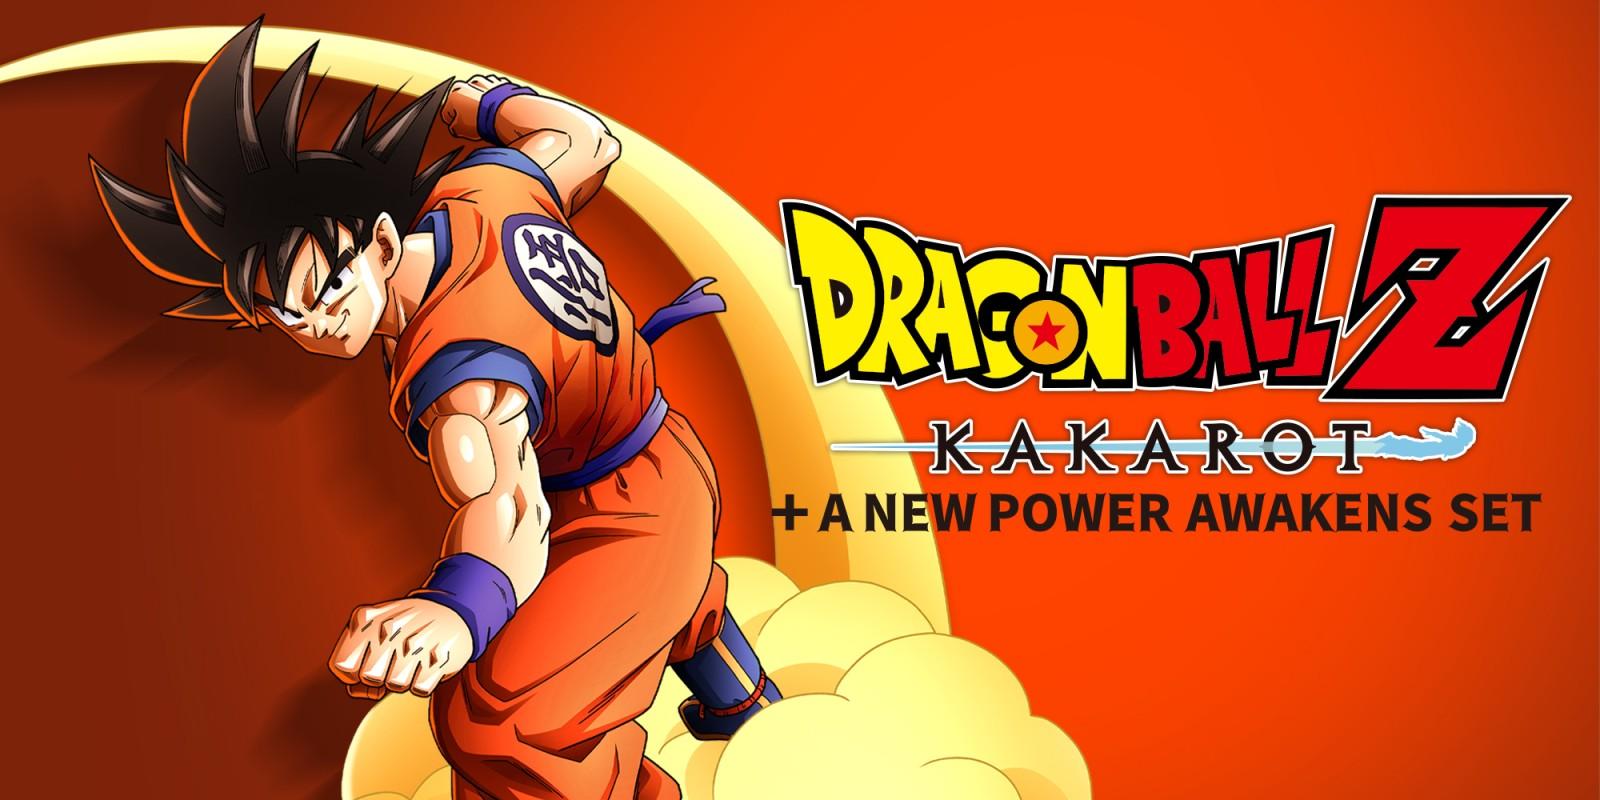 Dragon Ball Z: Kakarot Battle Video